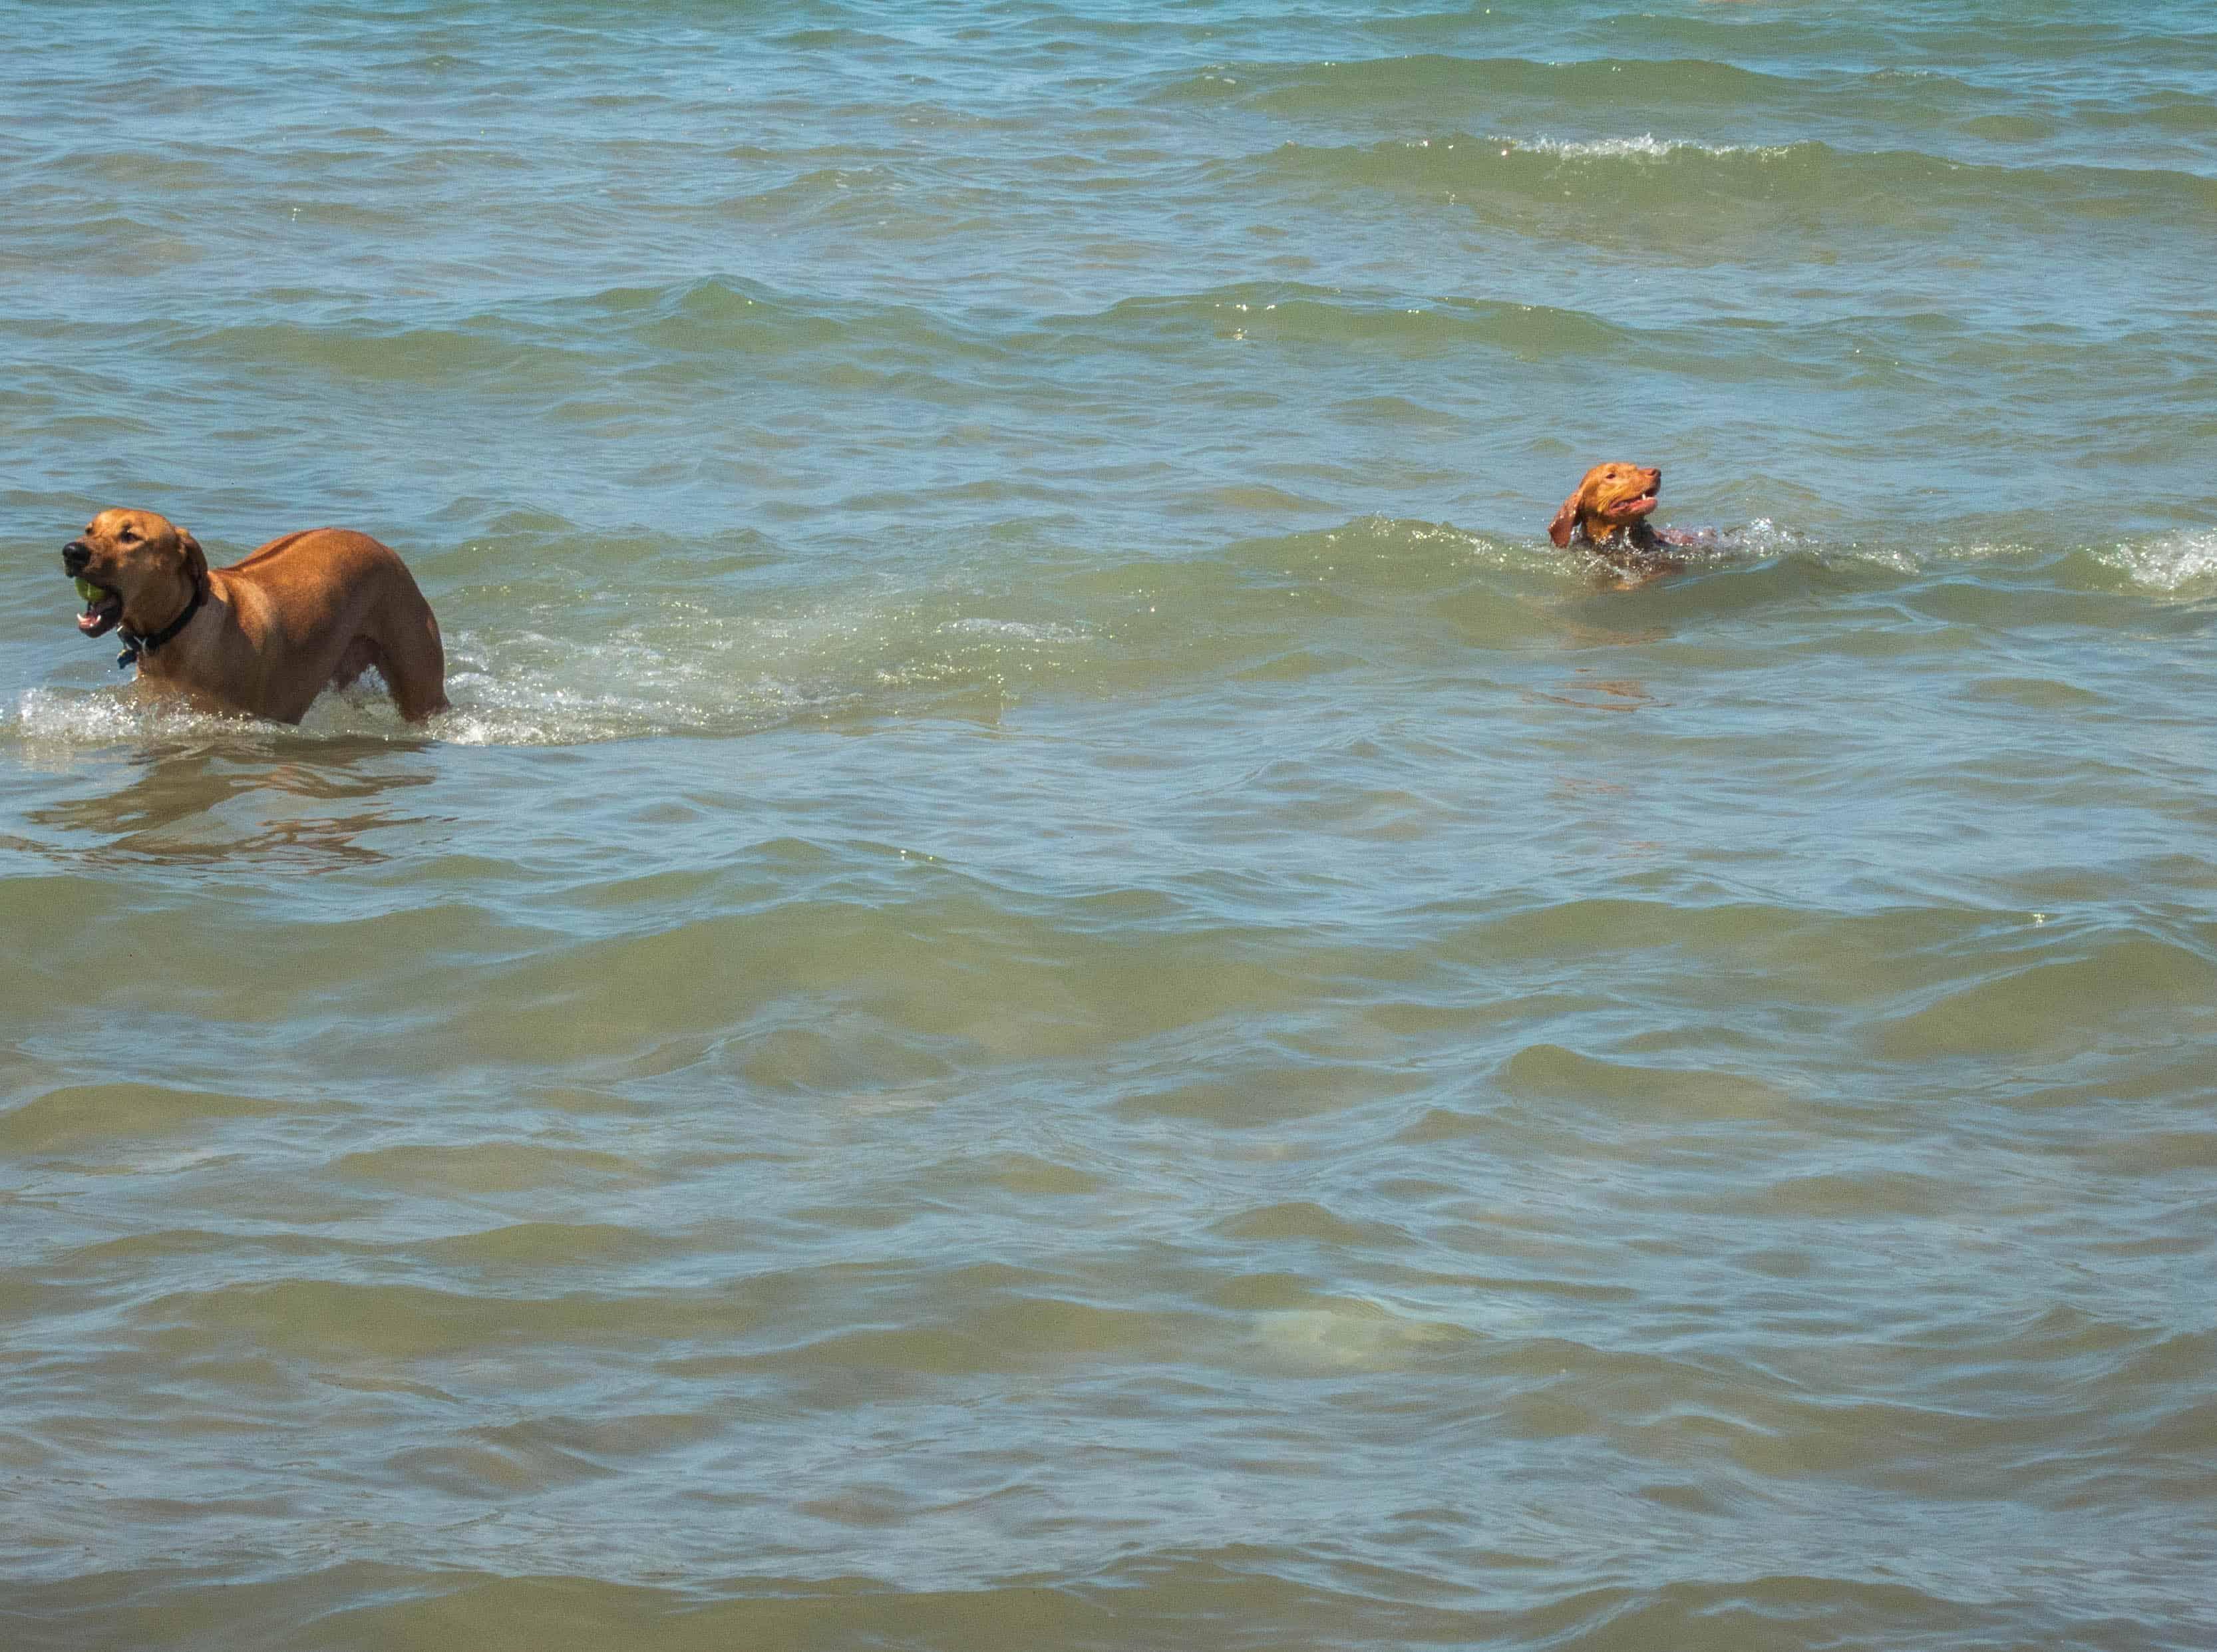 Rhodesian Ridgeback. dog adventure, Rhodesian Ridgeback photos, dog blog, dog beach, petcentric, marking our territory